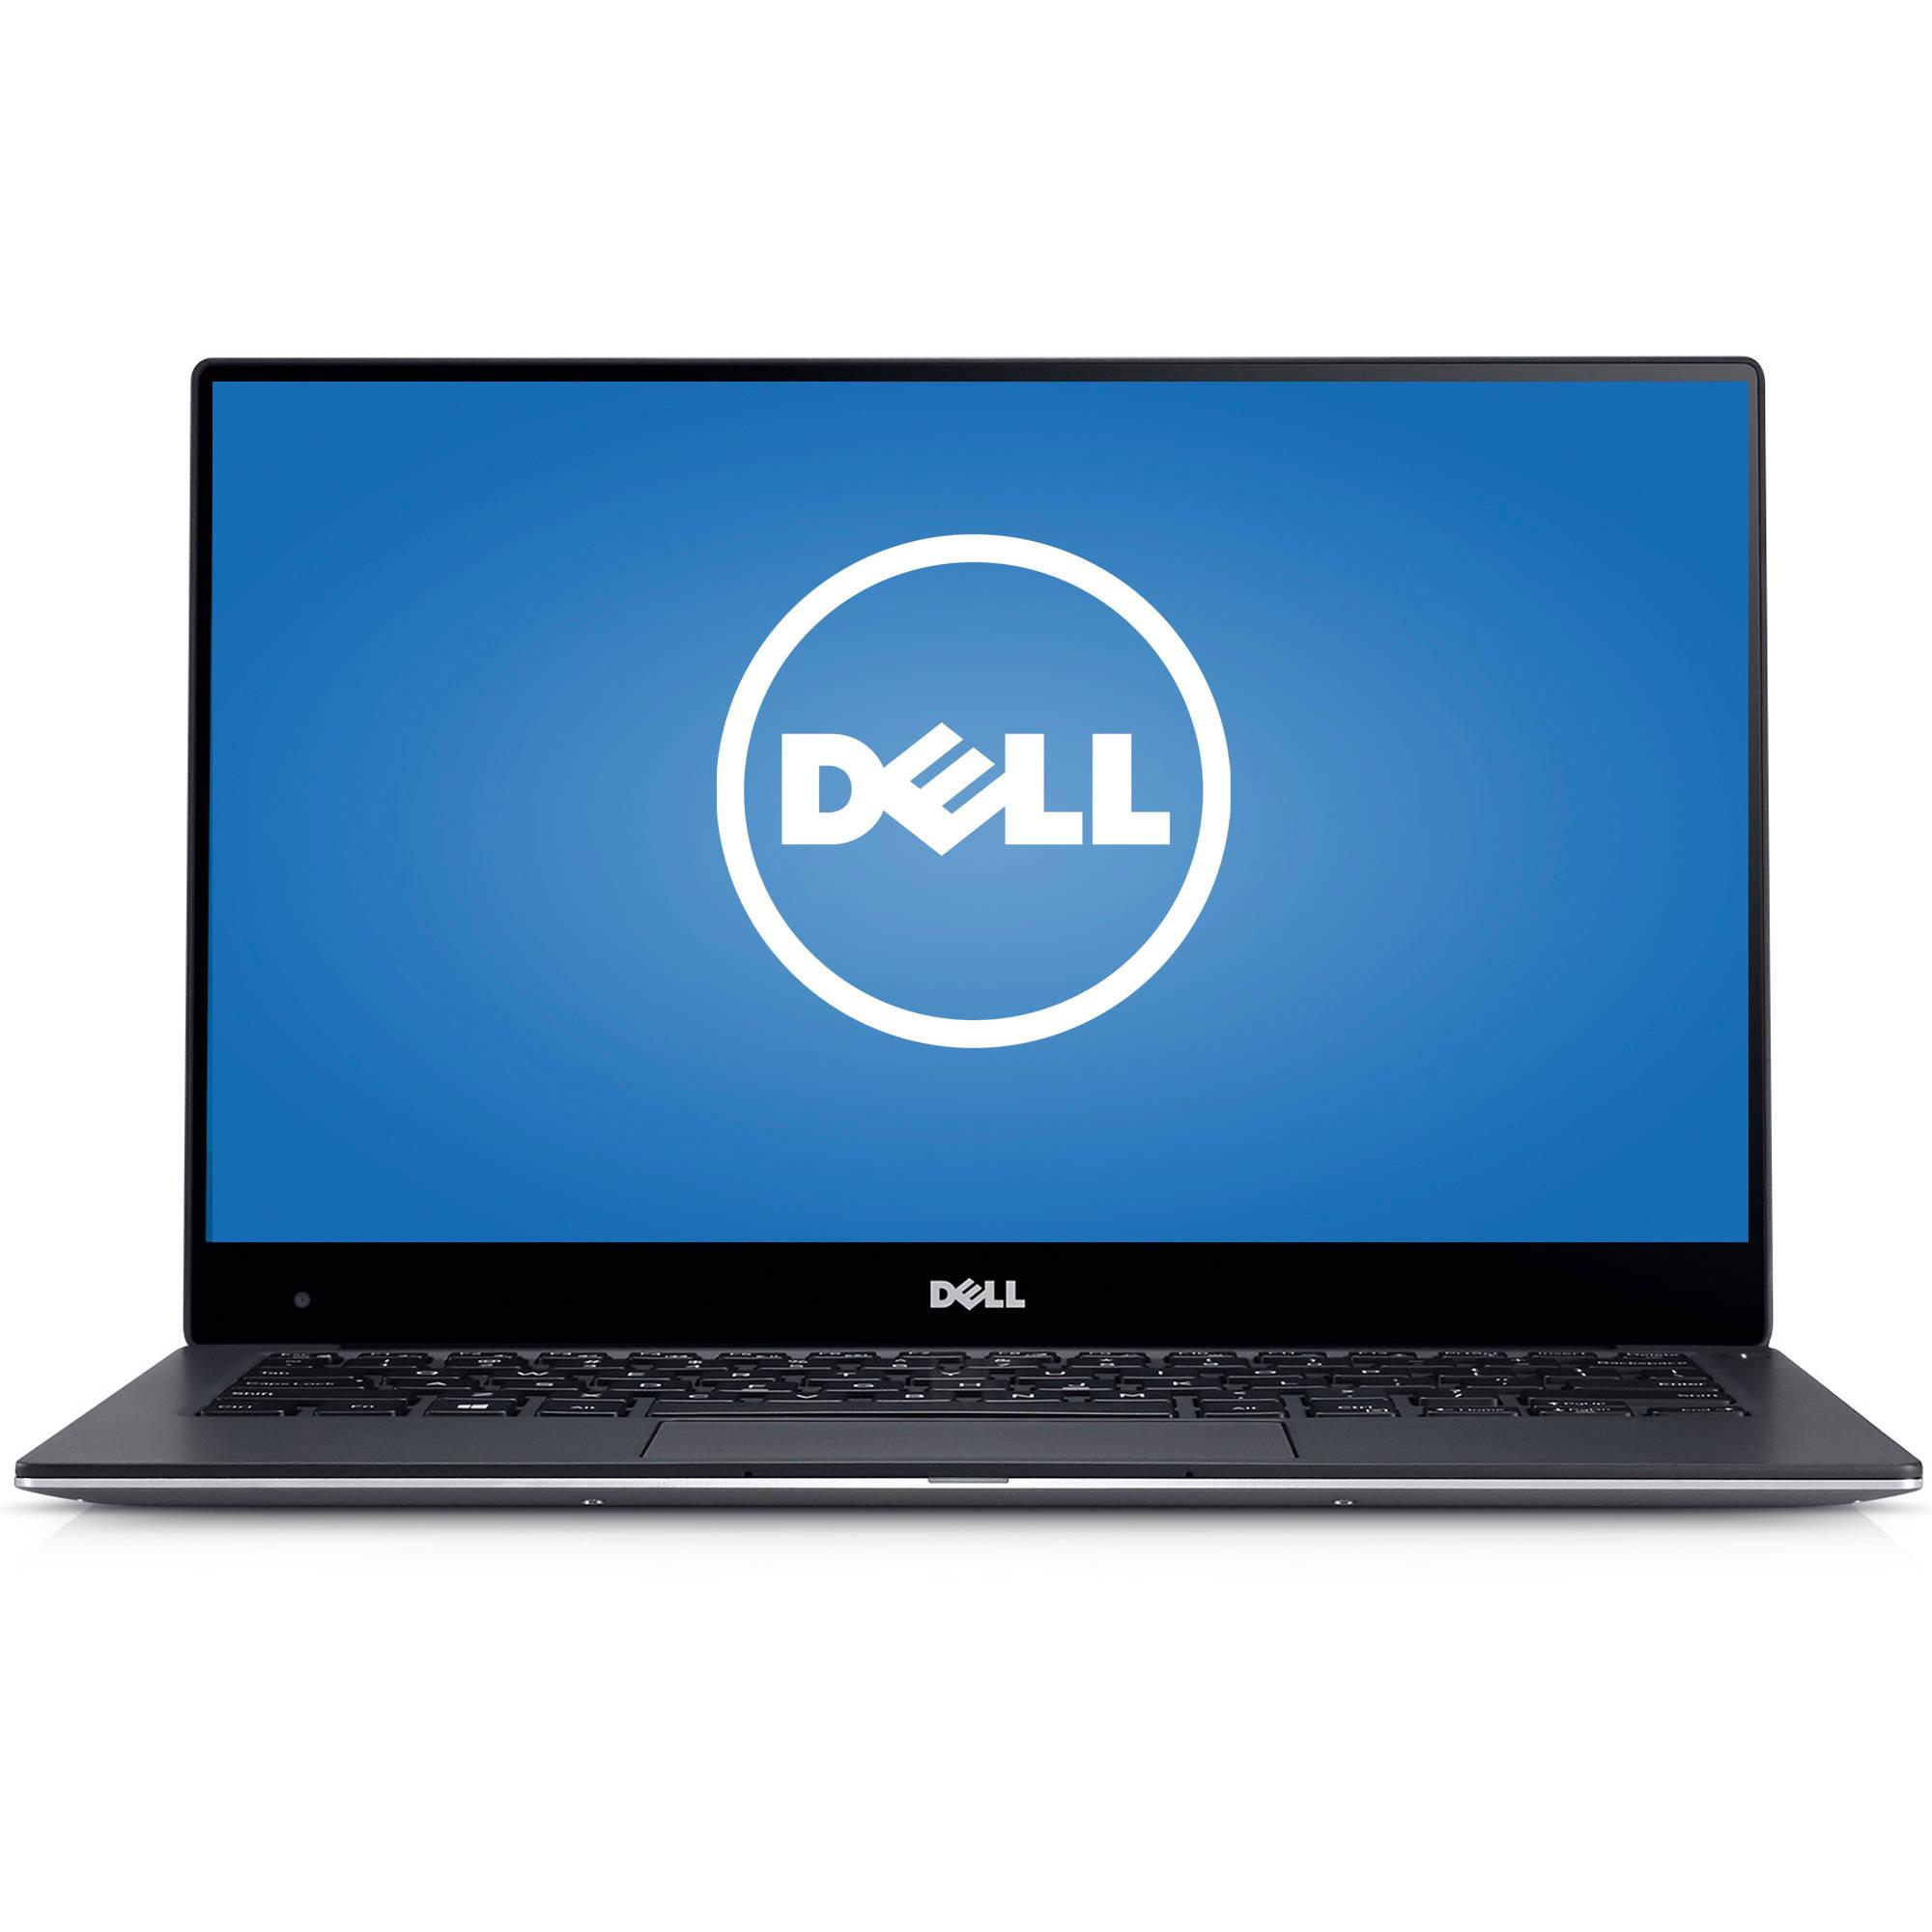 "Dell XPS 13.3"" Laptop, Touchscreen, Windows 10 Home, Intel Core i5-7200U Processor, 8GB RAM, 256GB Solid State Drive"